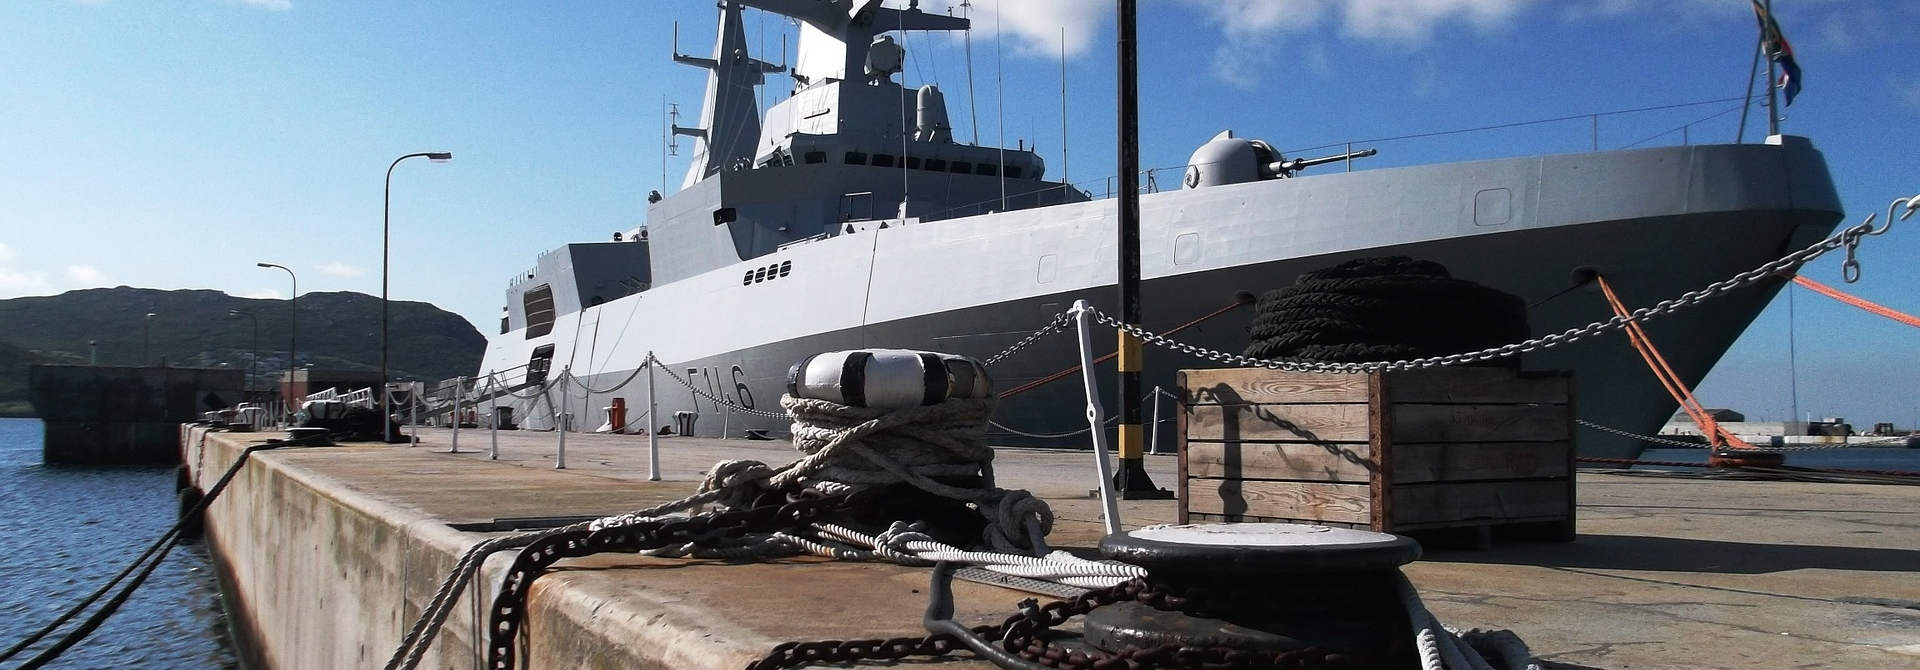 Defense Naval